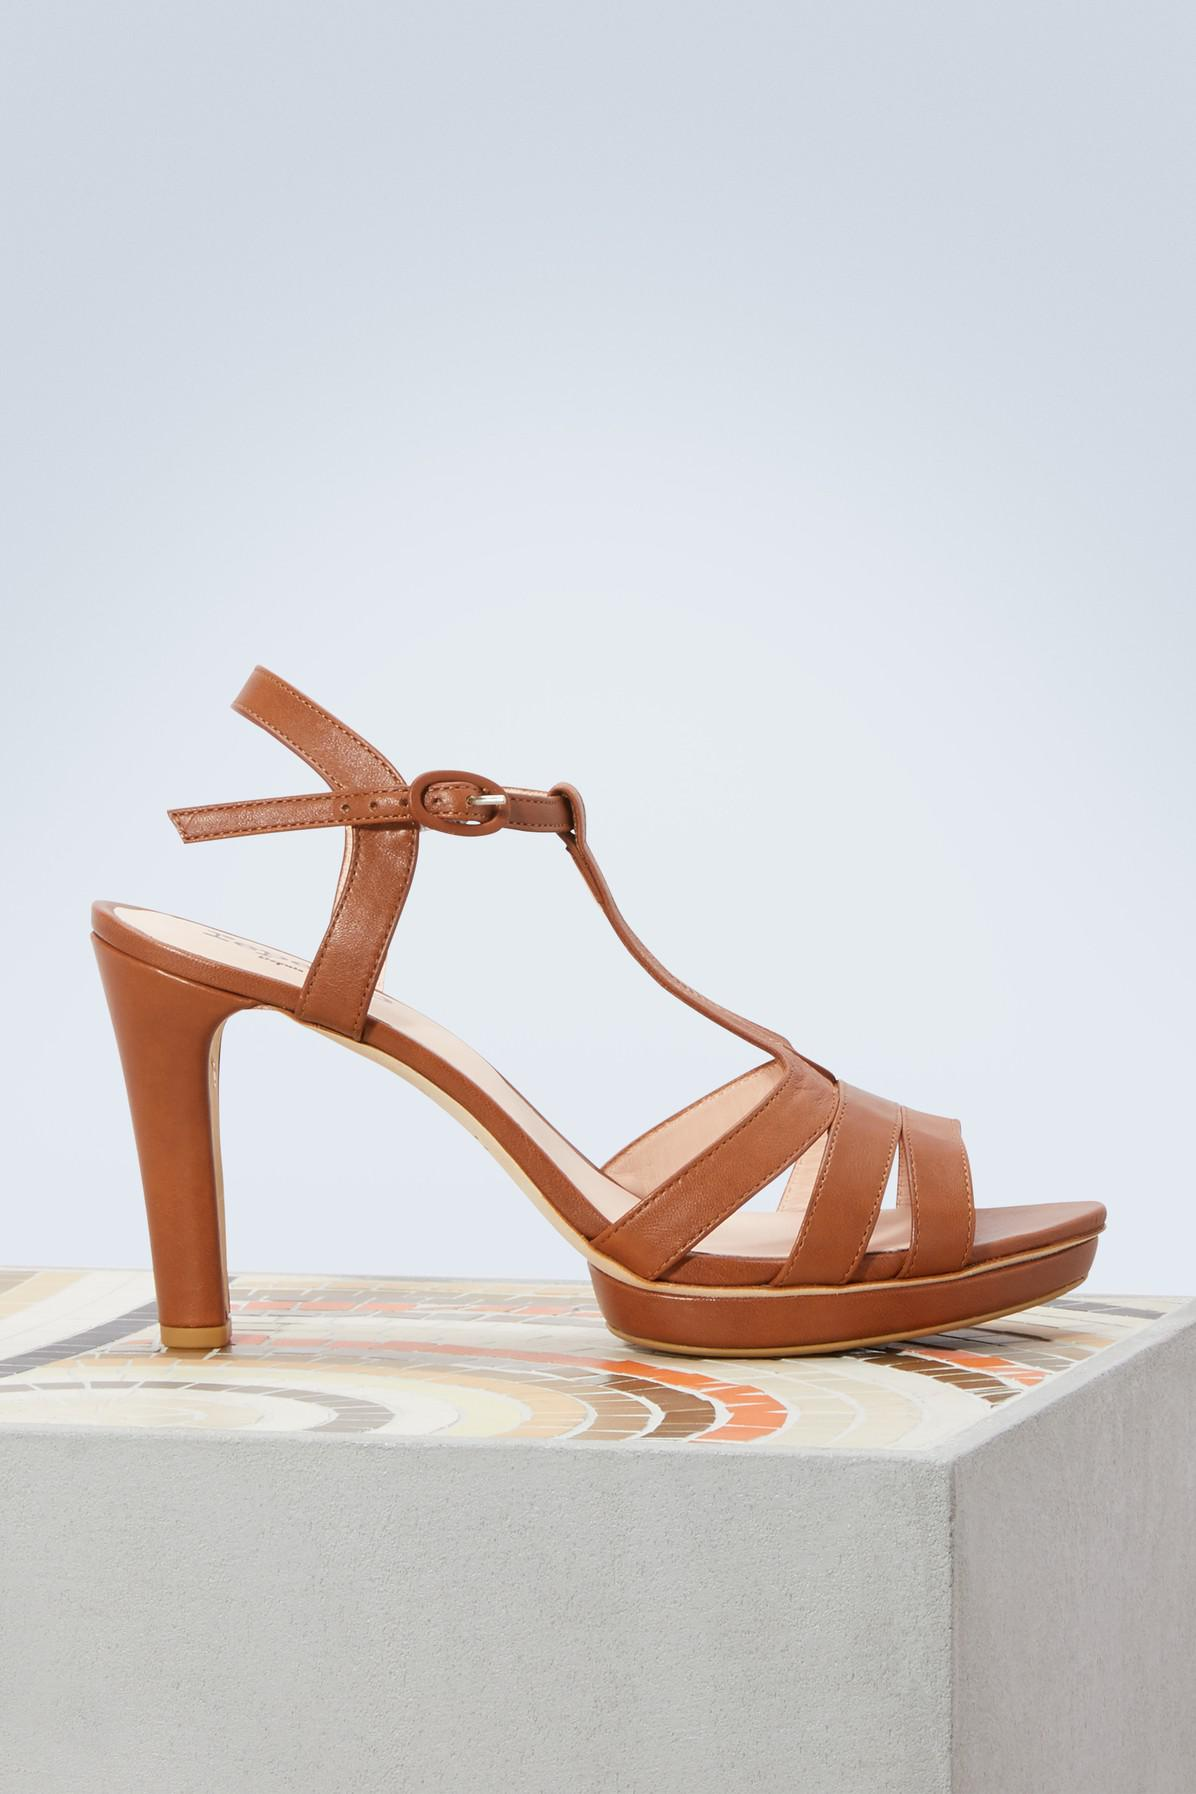 Repetto Bikini heeled sandals crnuLe